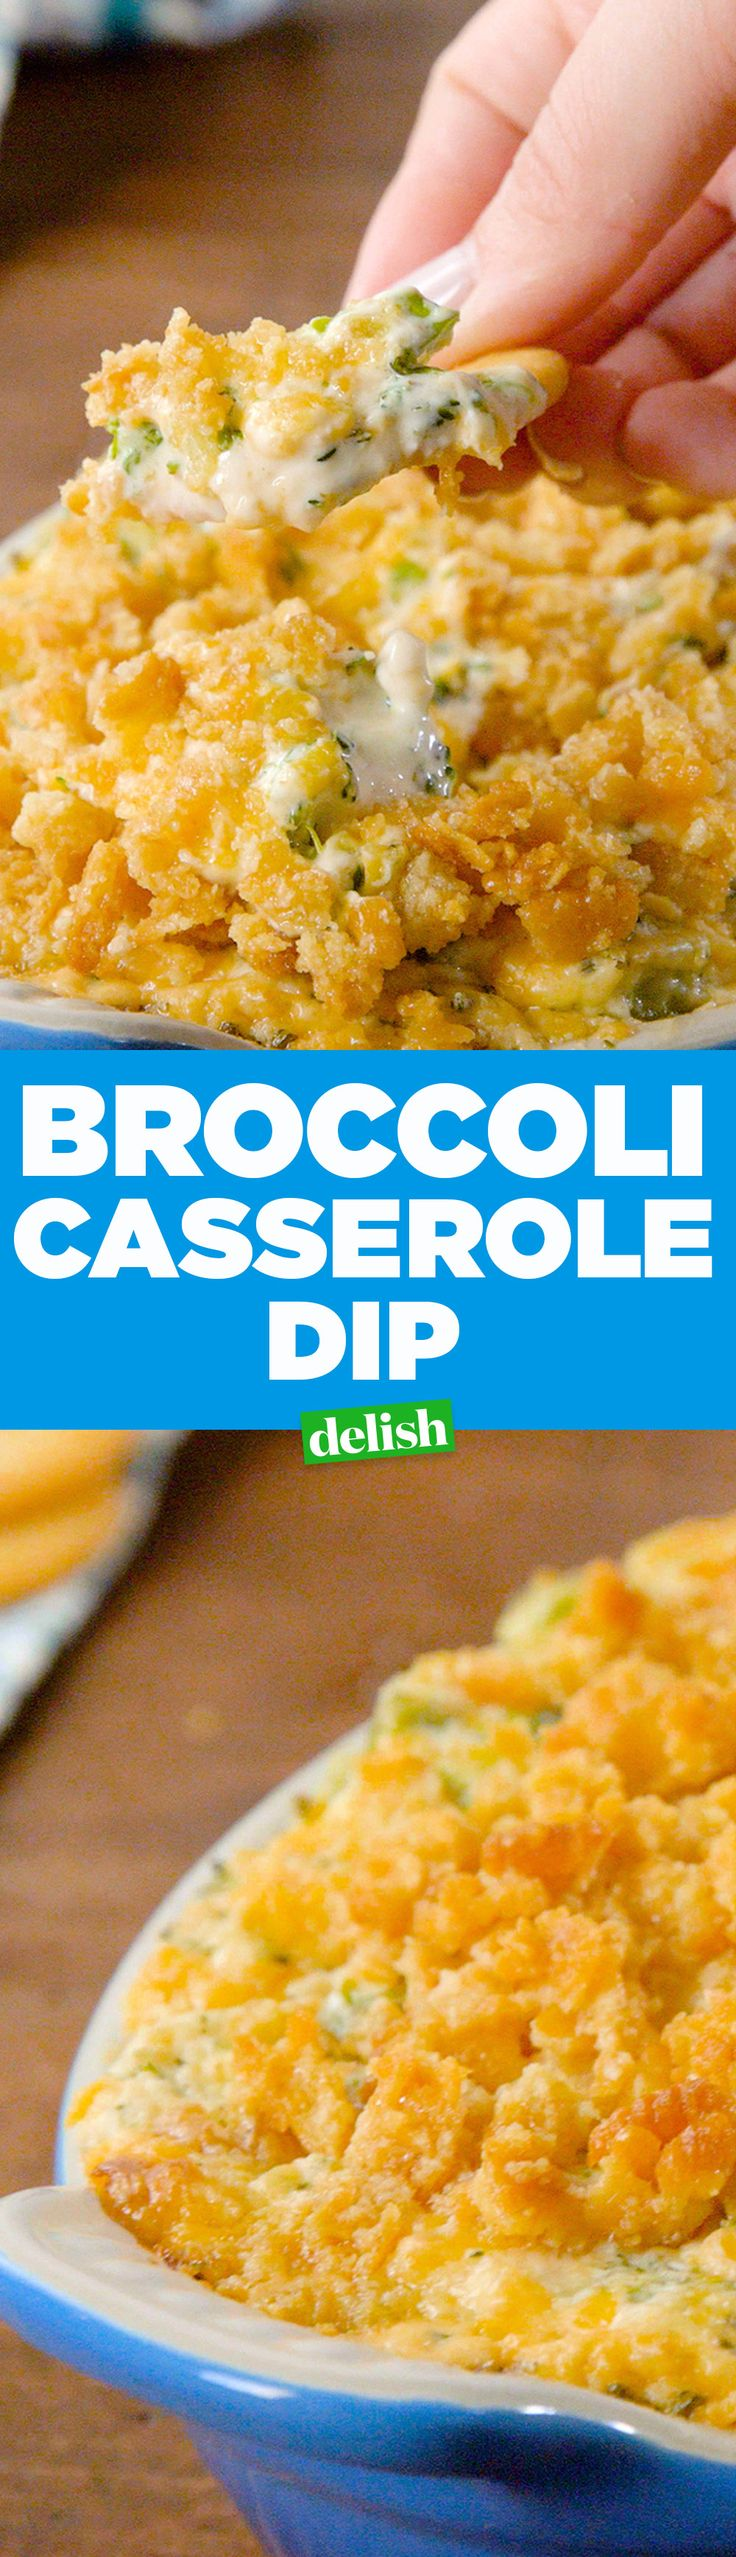 This Broccoli Casserole Dip will make you flip. Get the recipe on Delish.com.